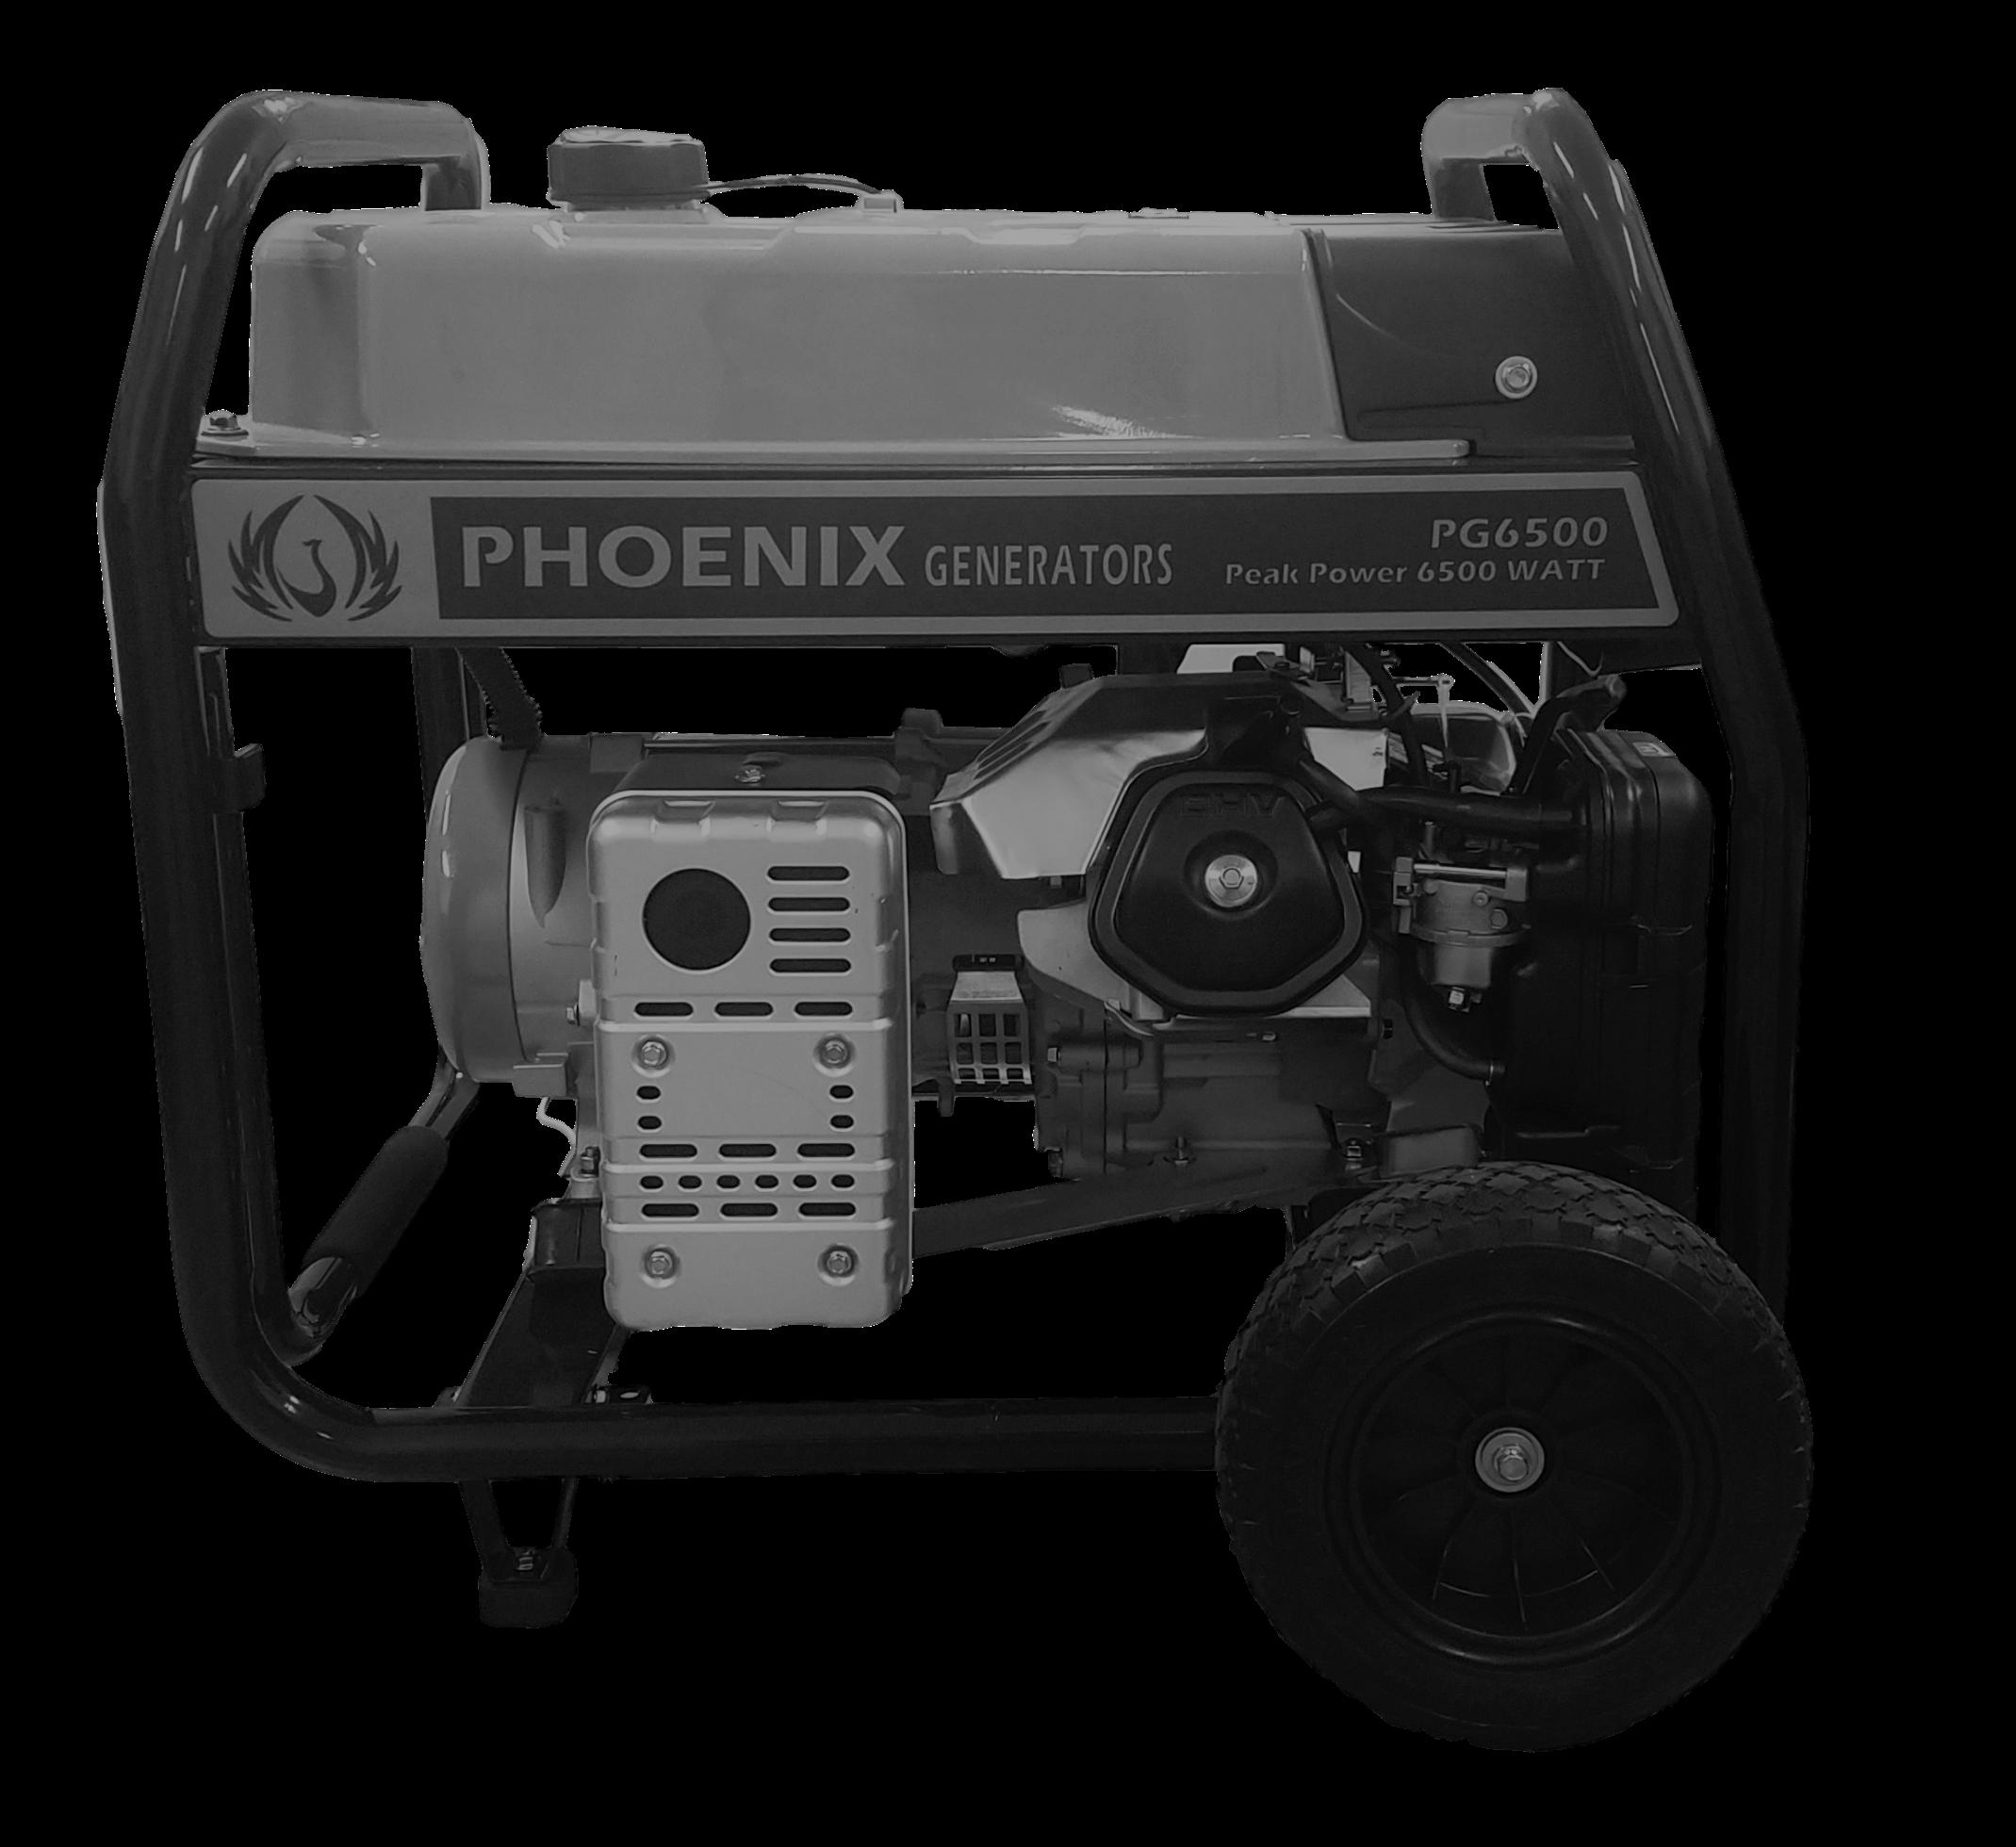 Phoenix 6500 Gas Generator